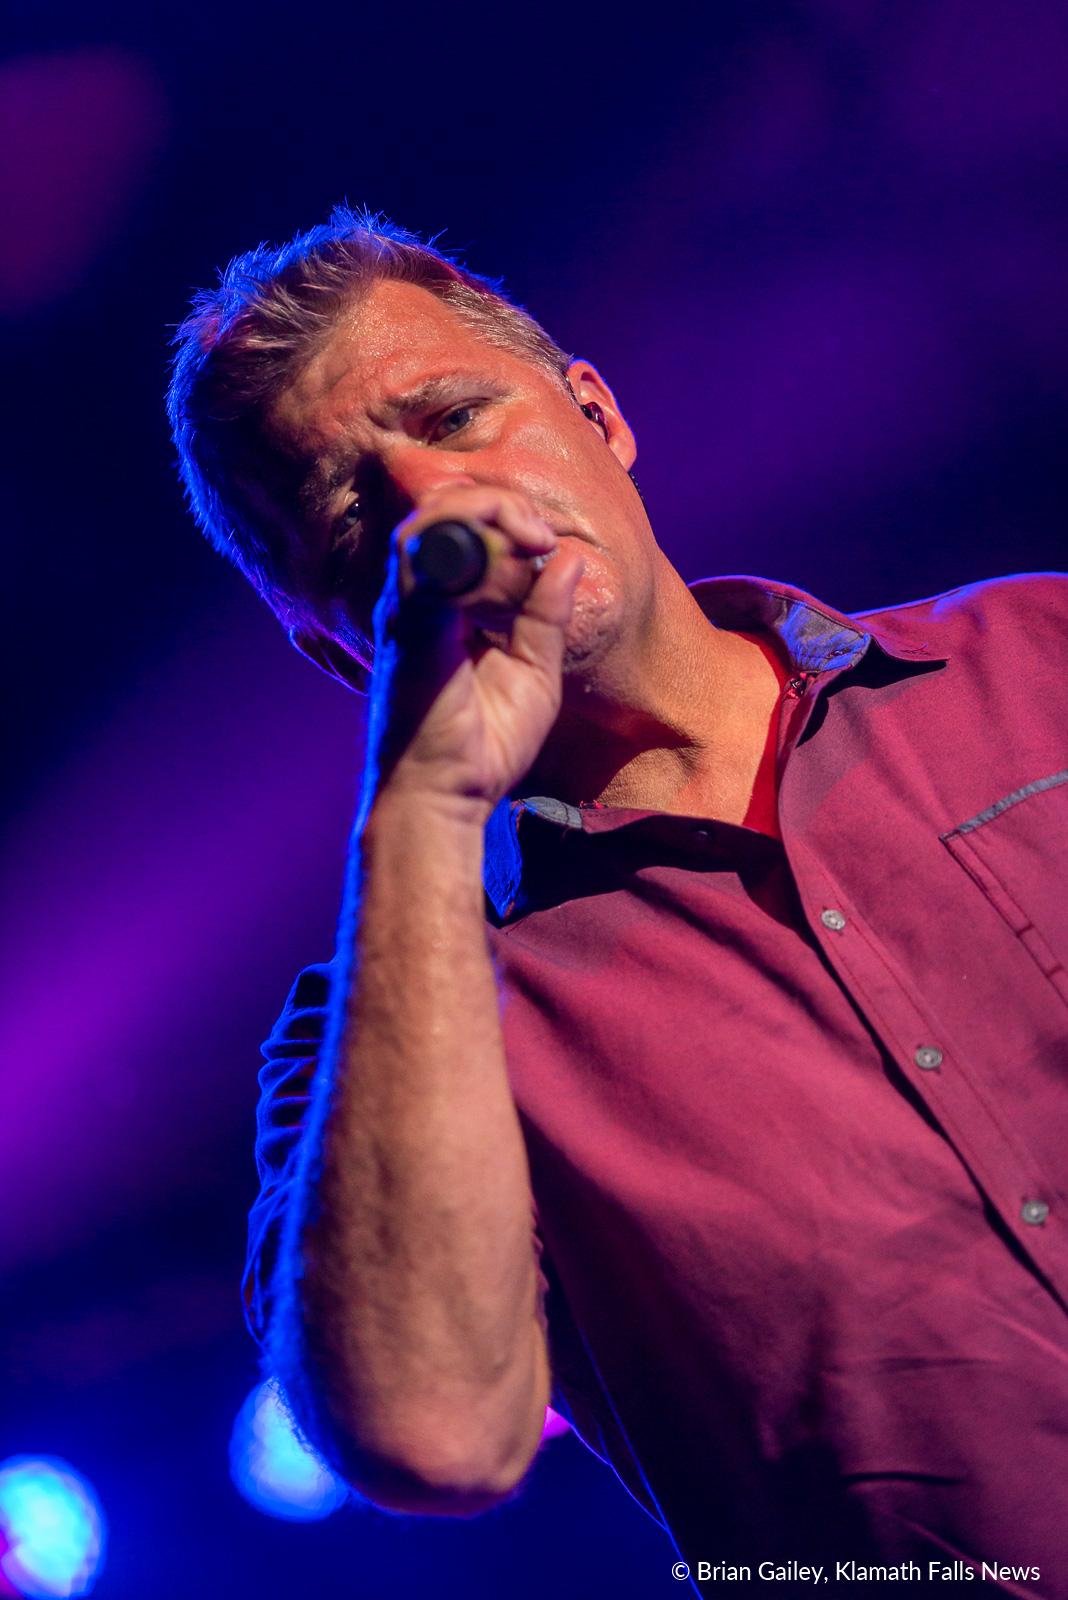 Lonestar's Richie McDonald performs for the 2019 Klamath County Fair. August 3, 2019. (Image, Brian Gailey / Klamath Falls News)